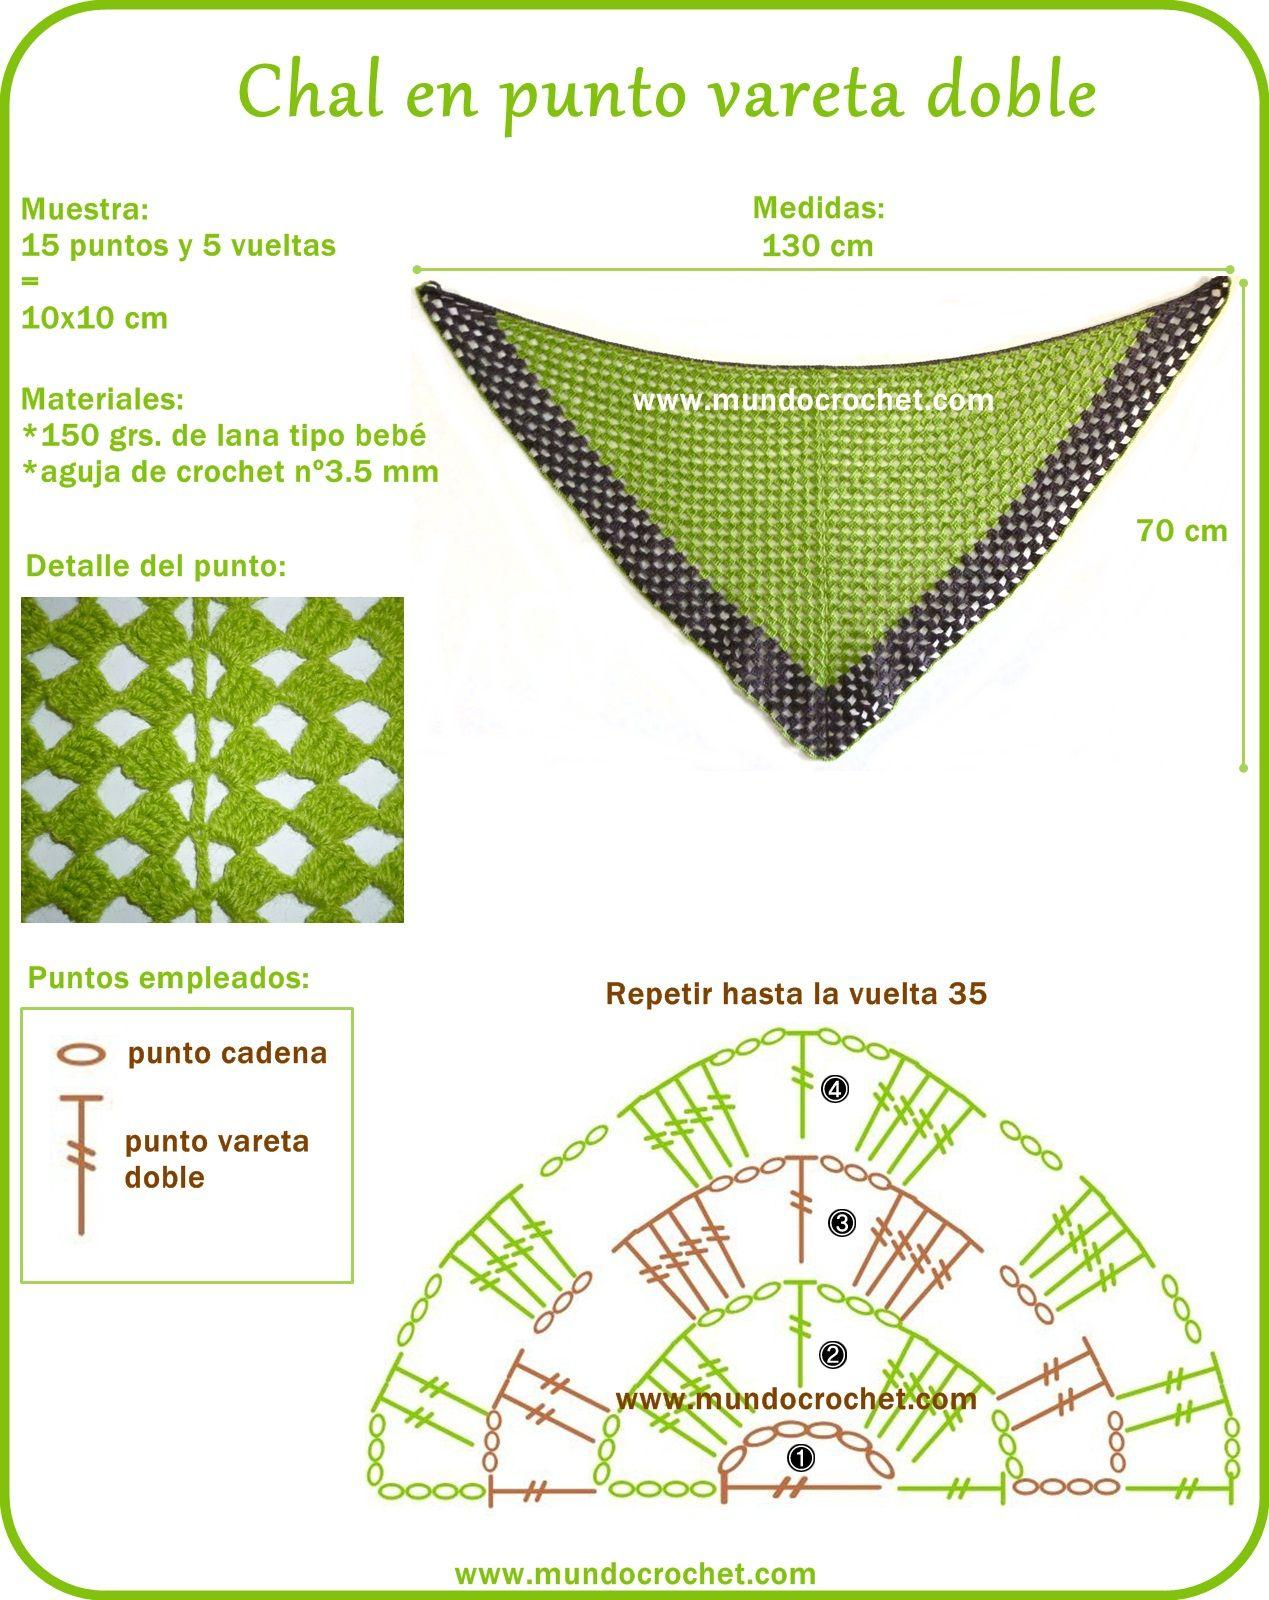 Chal crochet punto vareta doble - Crochet shawl | chal | Pinterest ...